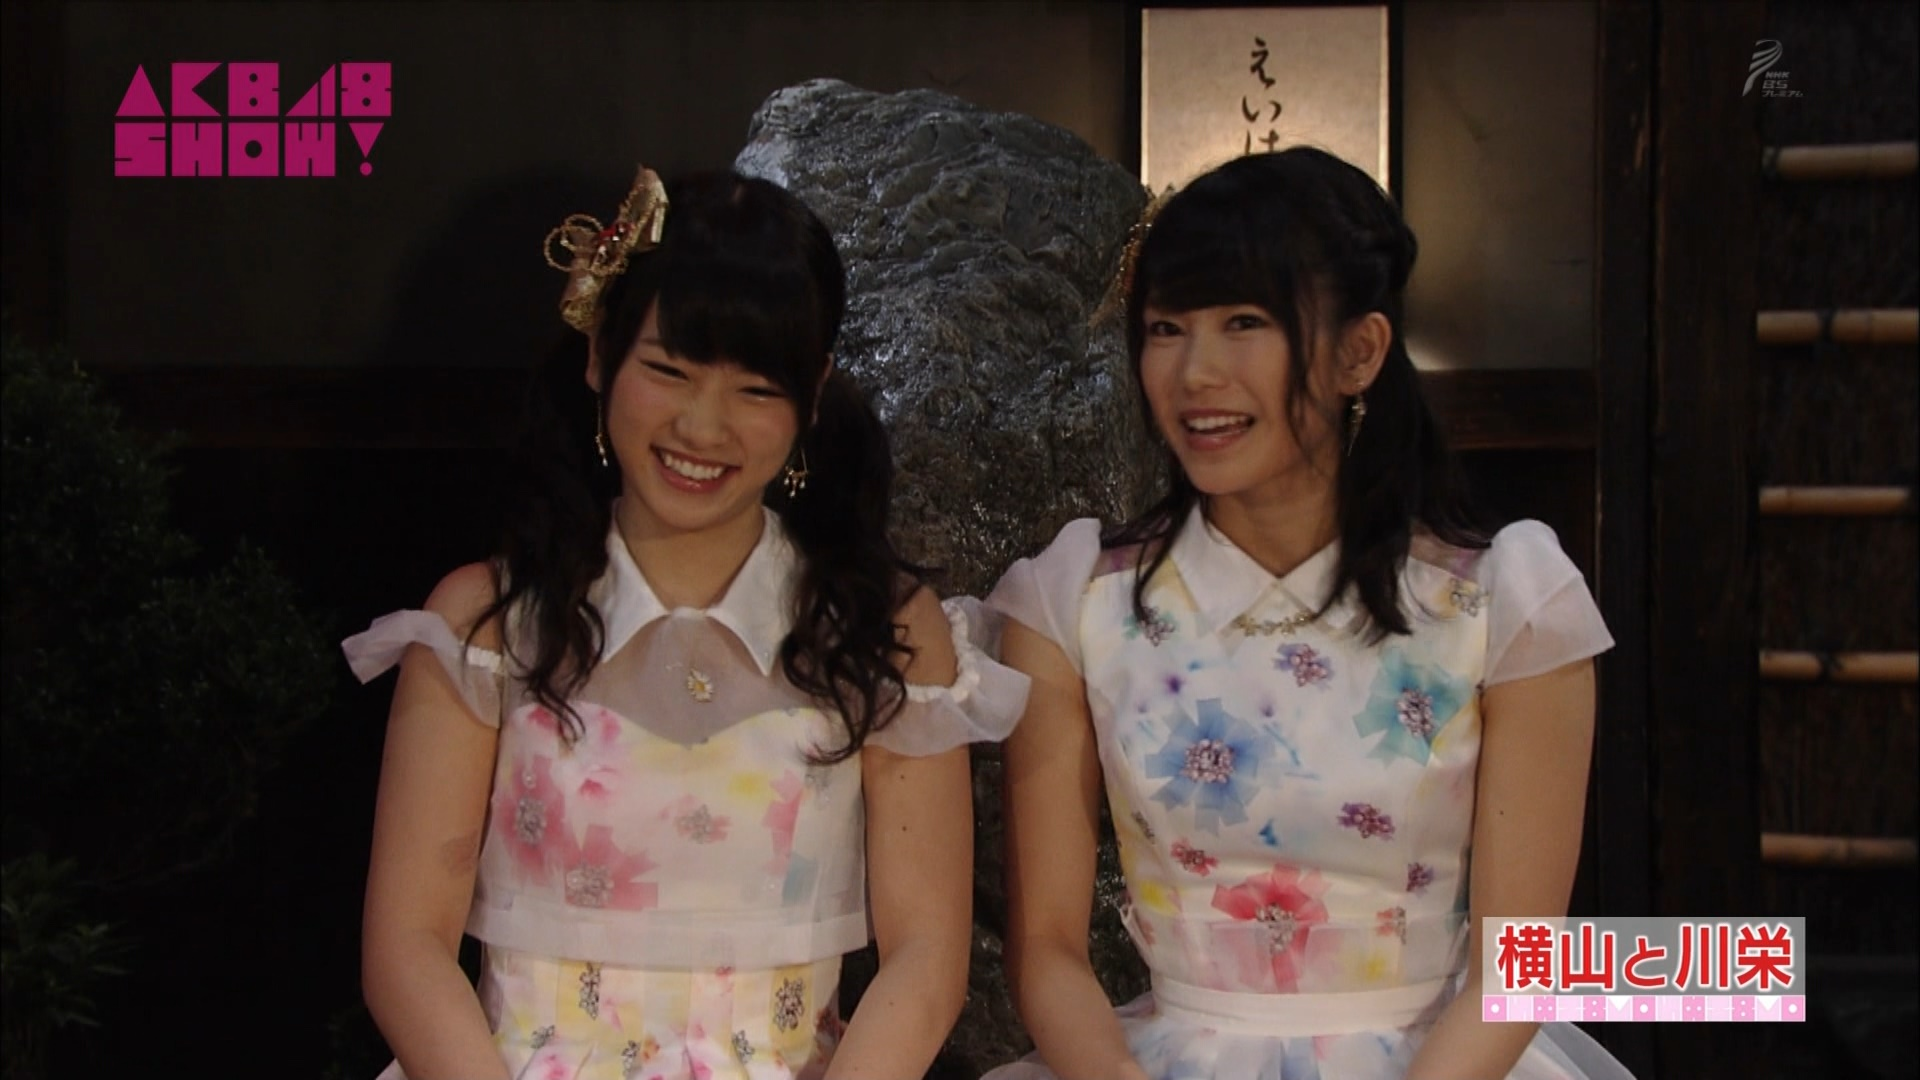 横山由依と川栄李奈 AKB48SHOW! 20140906 (15)